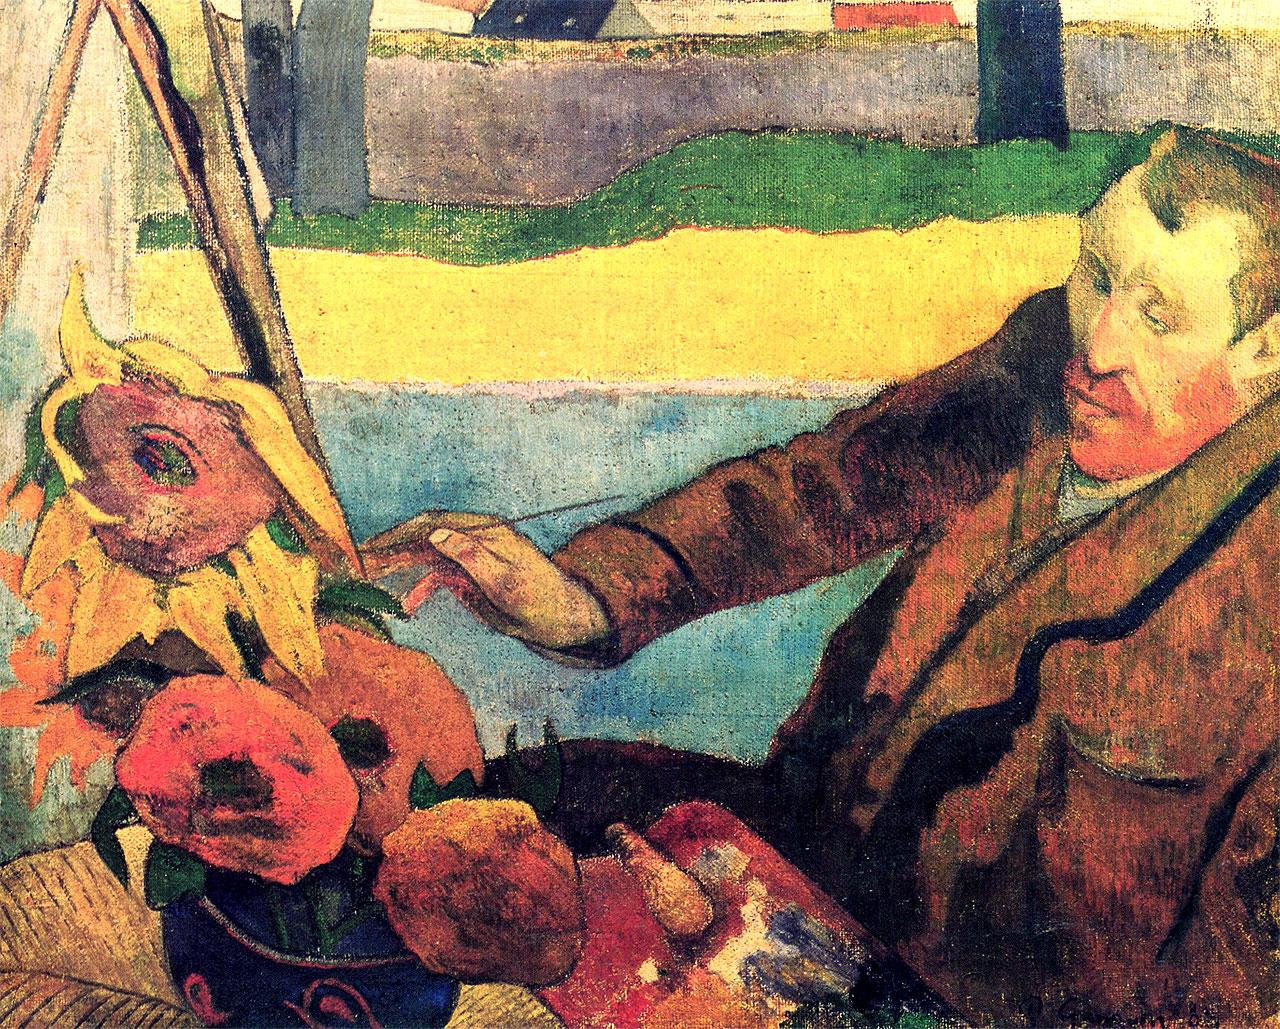 Vincent Van Gogh Malt Sonnenblumen Von Paul Cézanne